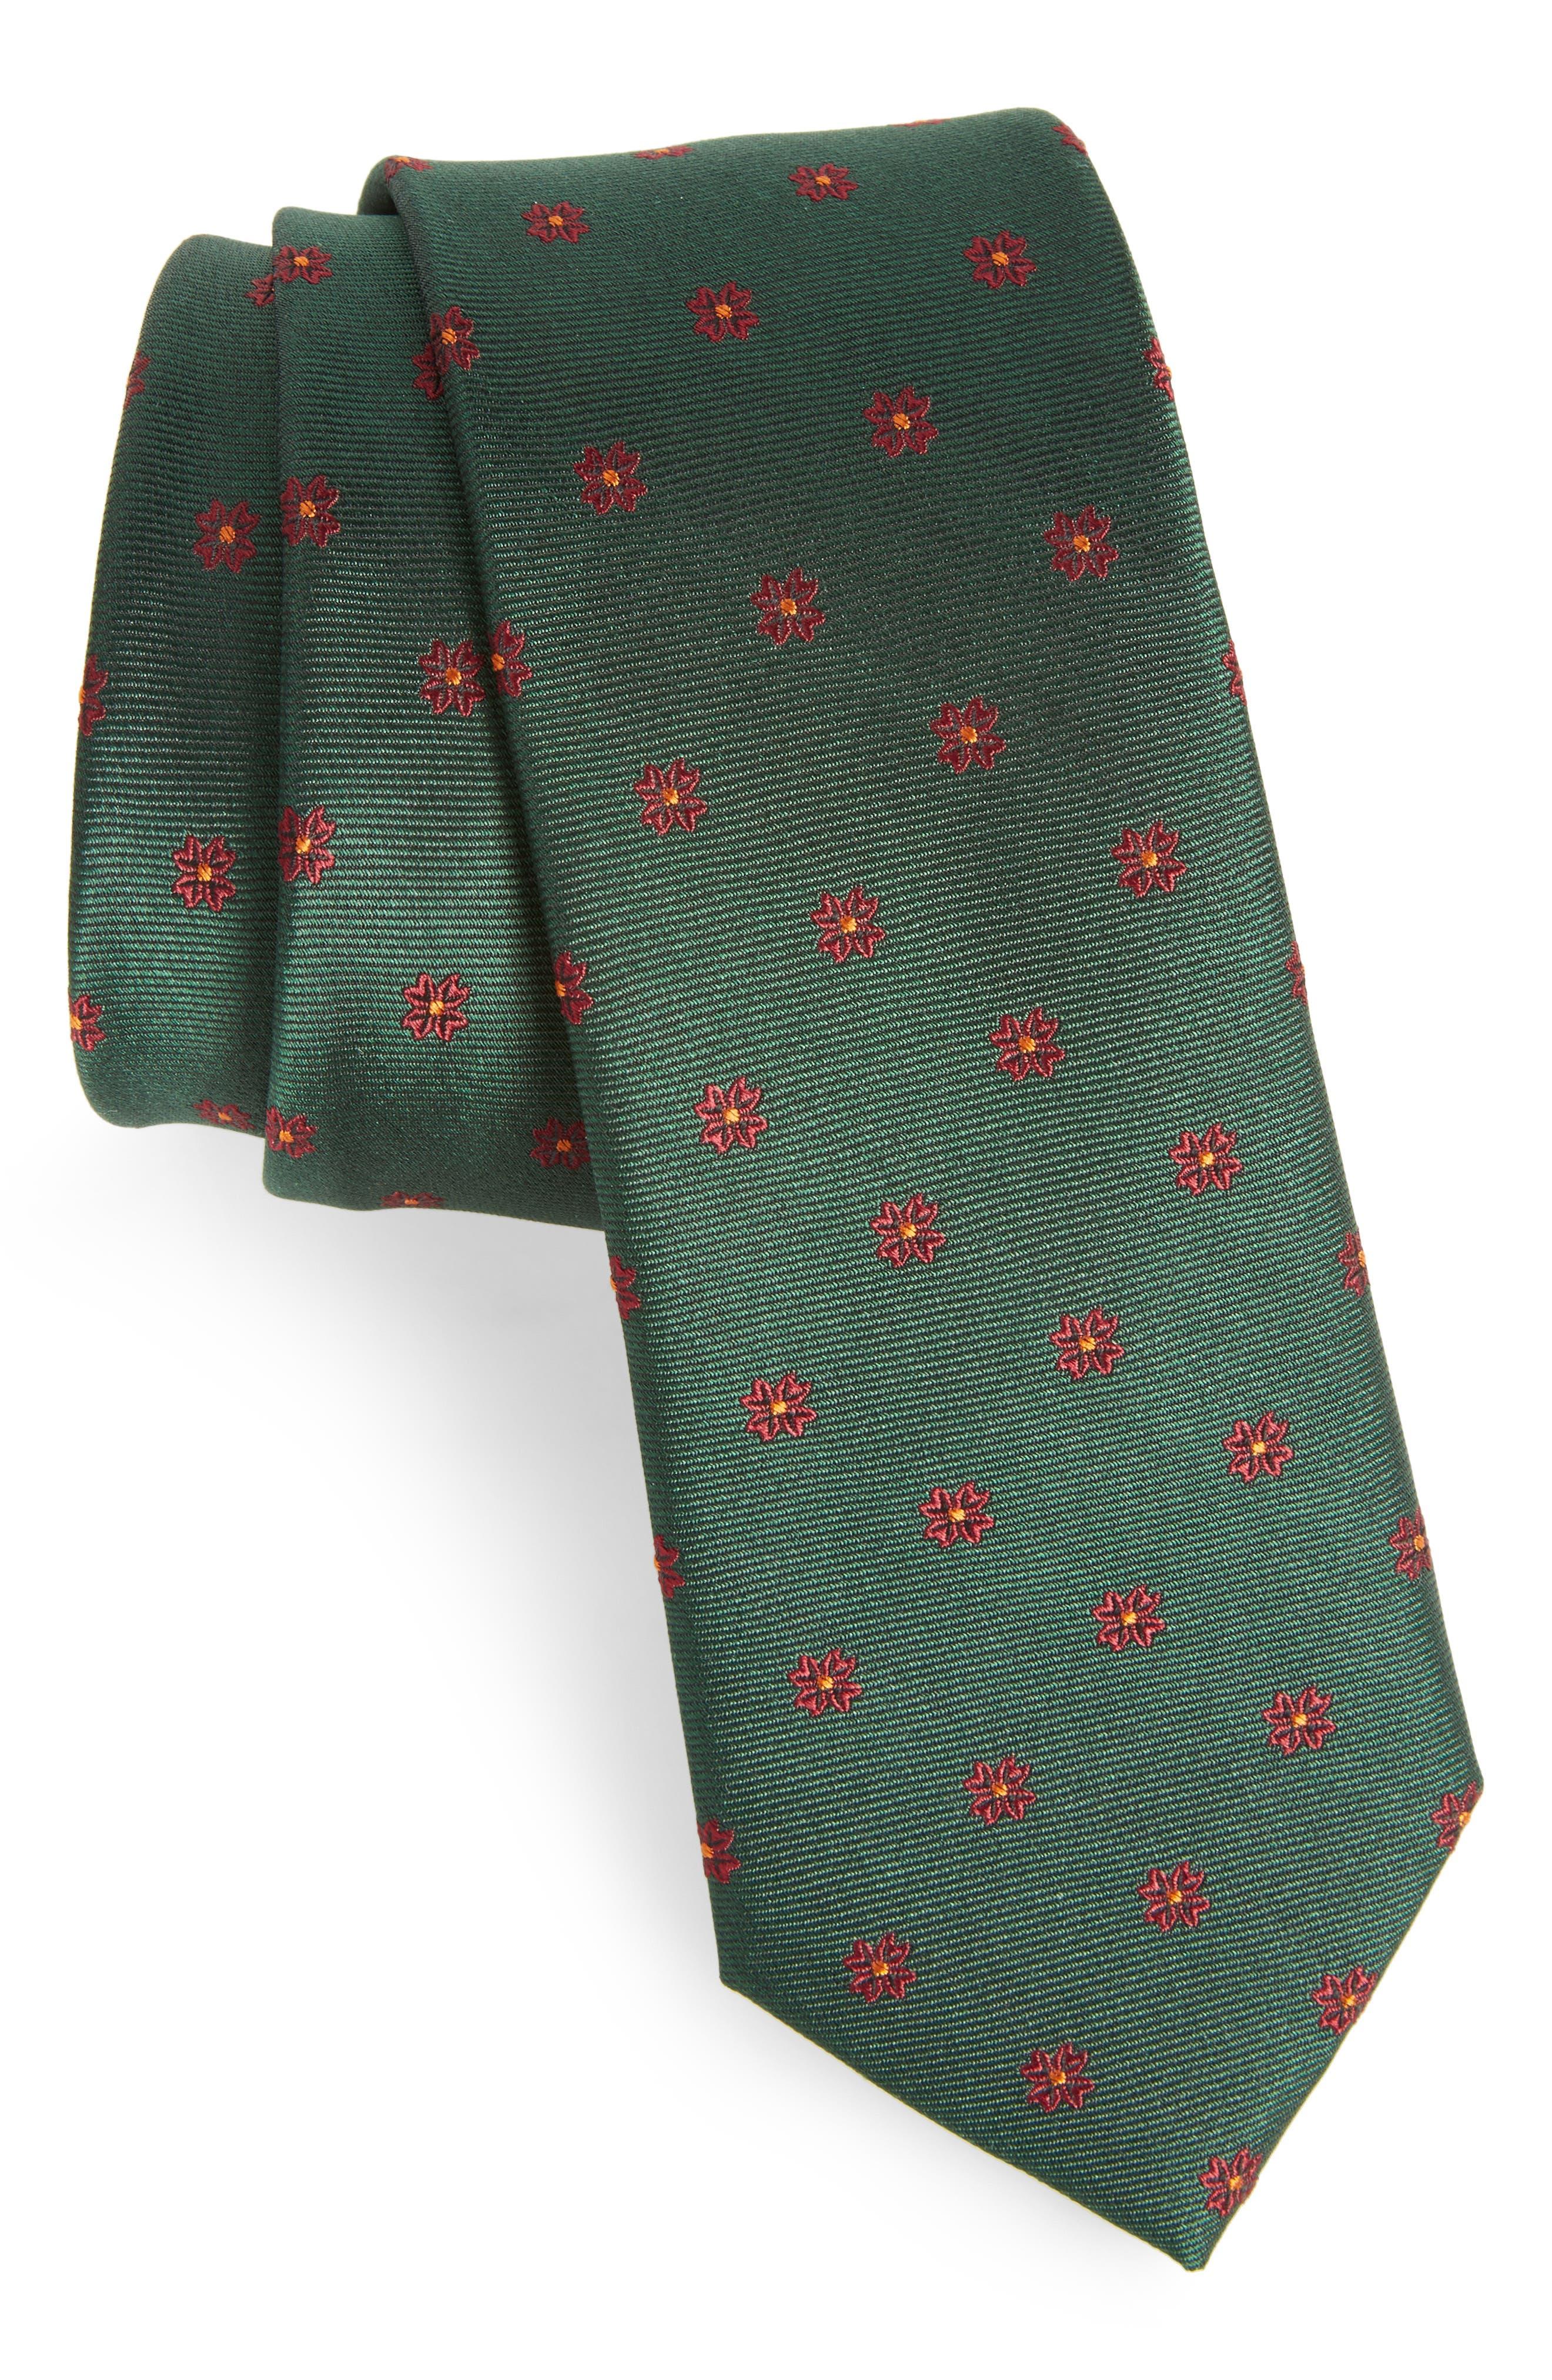 Main Image - The Tie Bar Floral Span Medallion Silk Tie